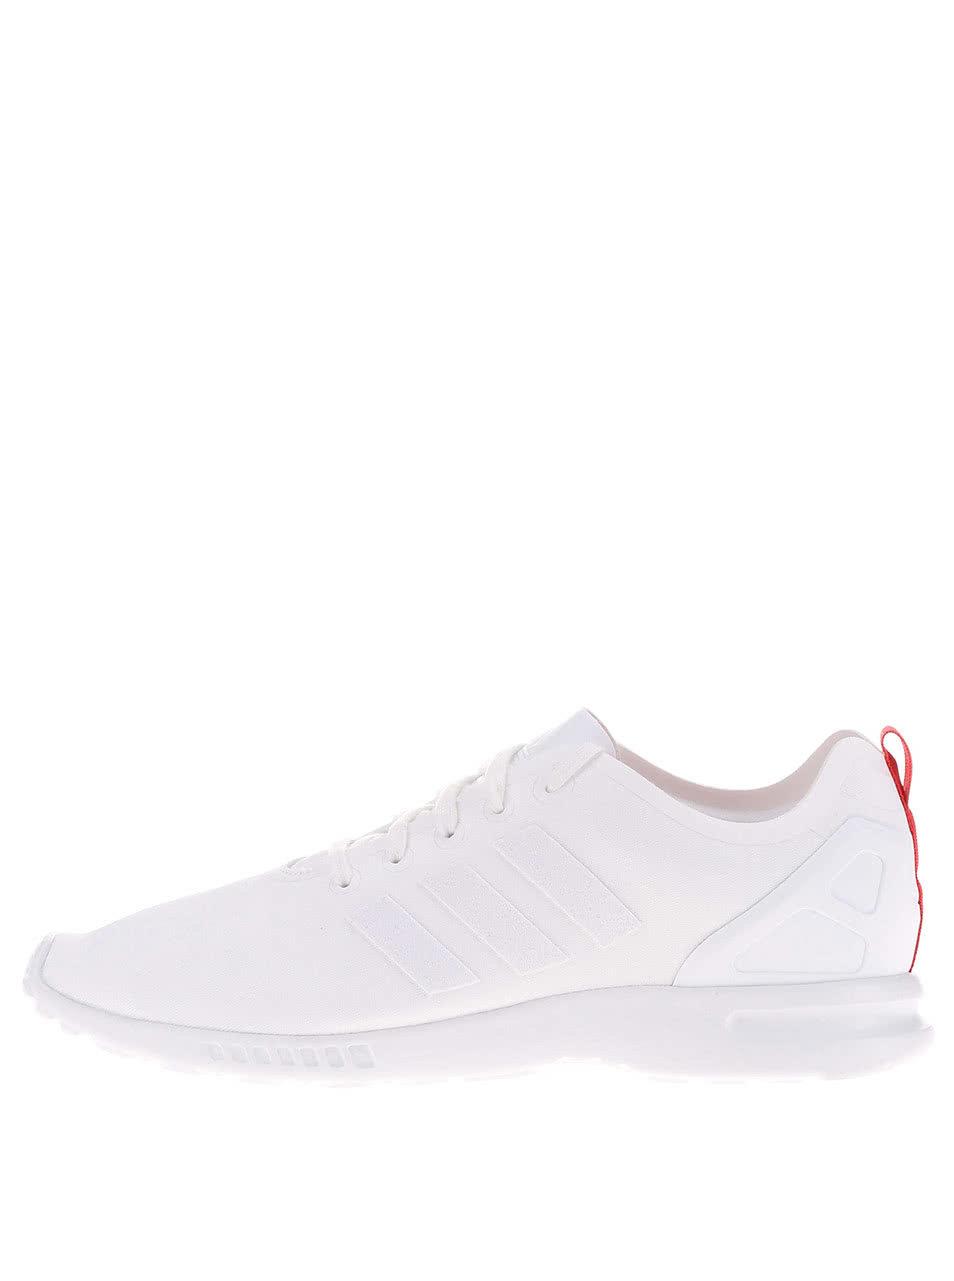 Biele dámske tenisky adidas Originals ZX Flux ... cf343ae2ea2